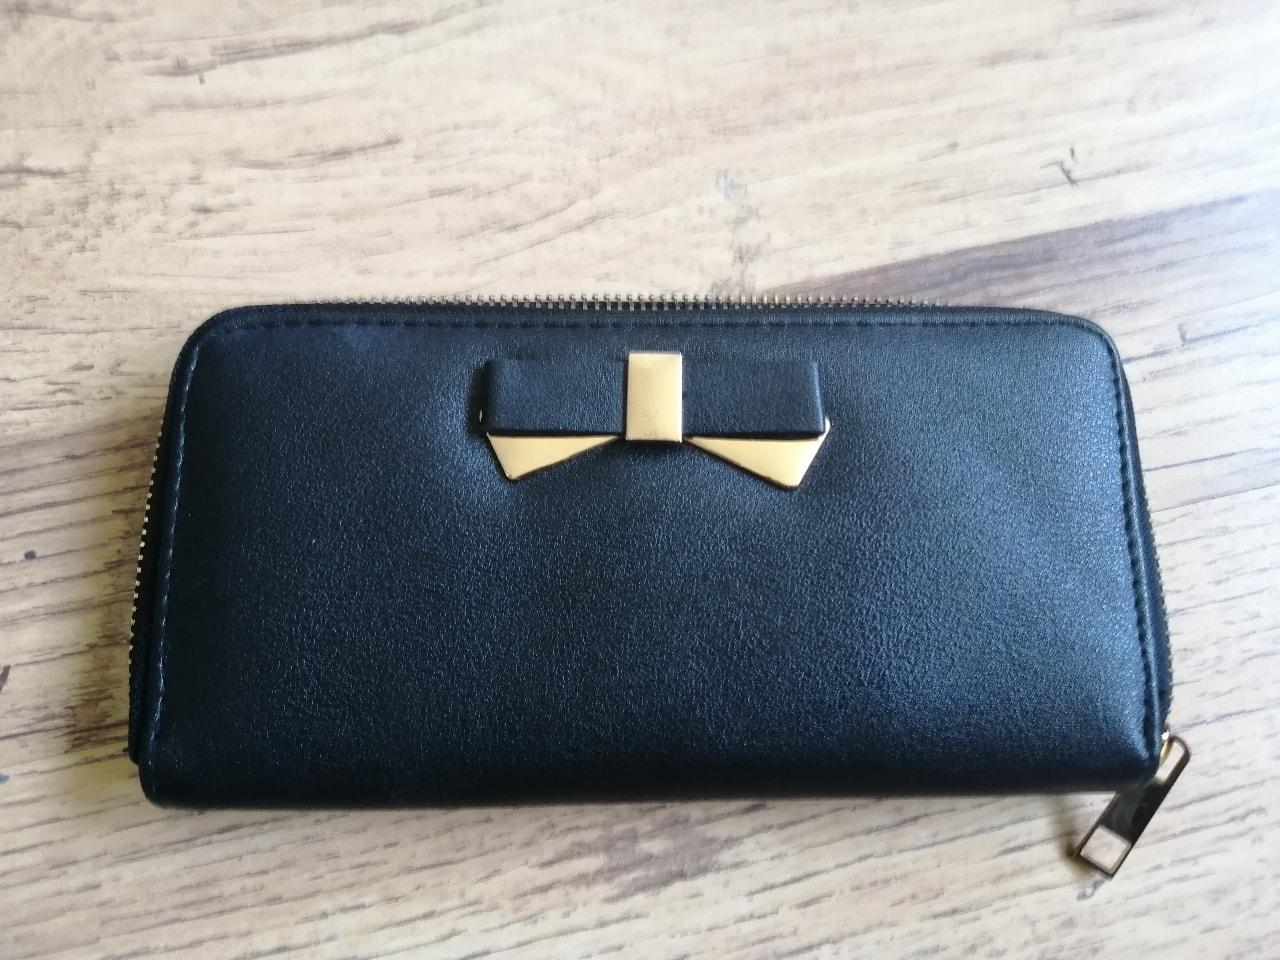 Black Primark purse